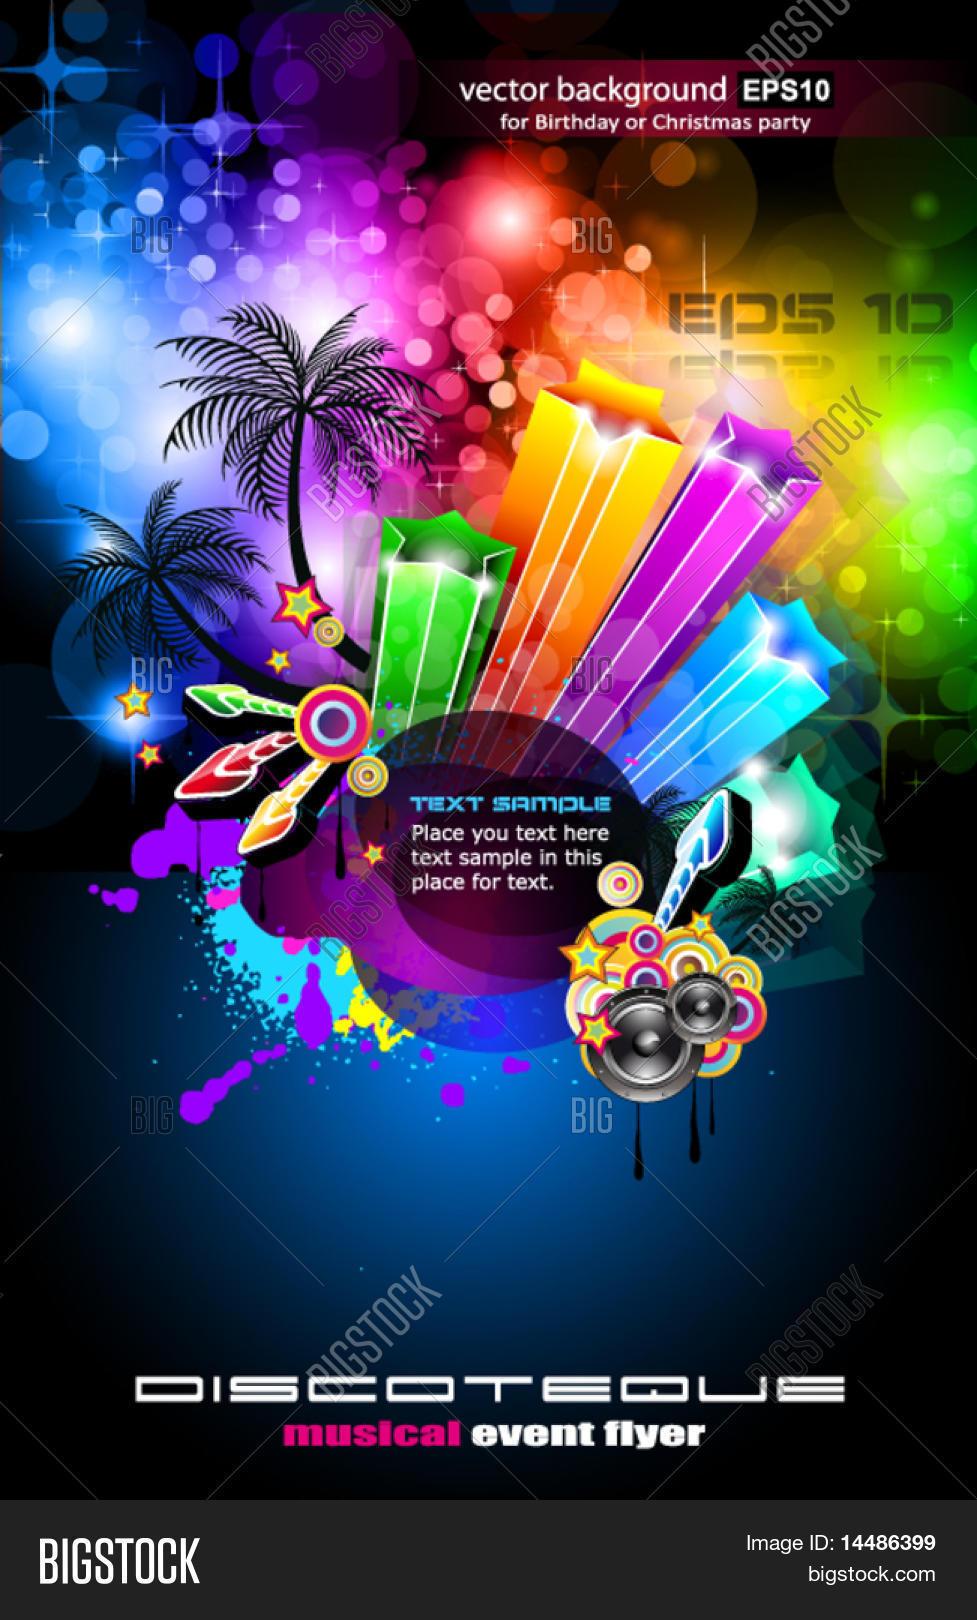 Top Disco Dance Tropical Music Flyer Vector & Photo   Bigstock GE17